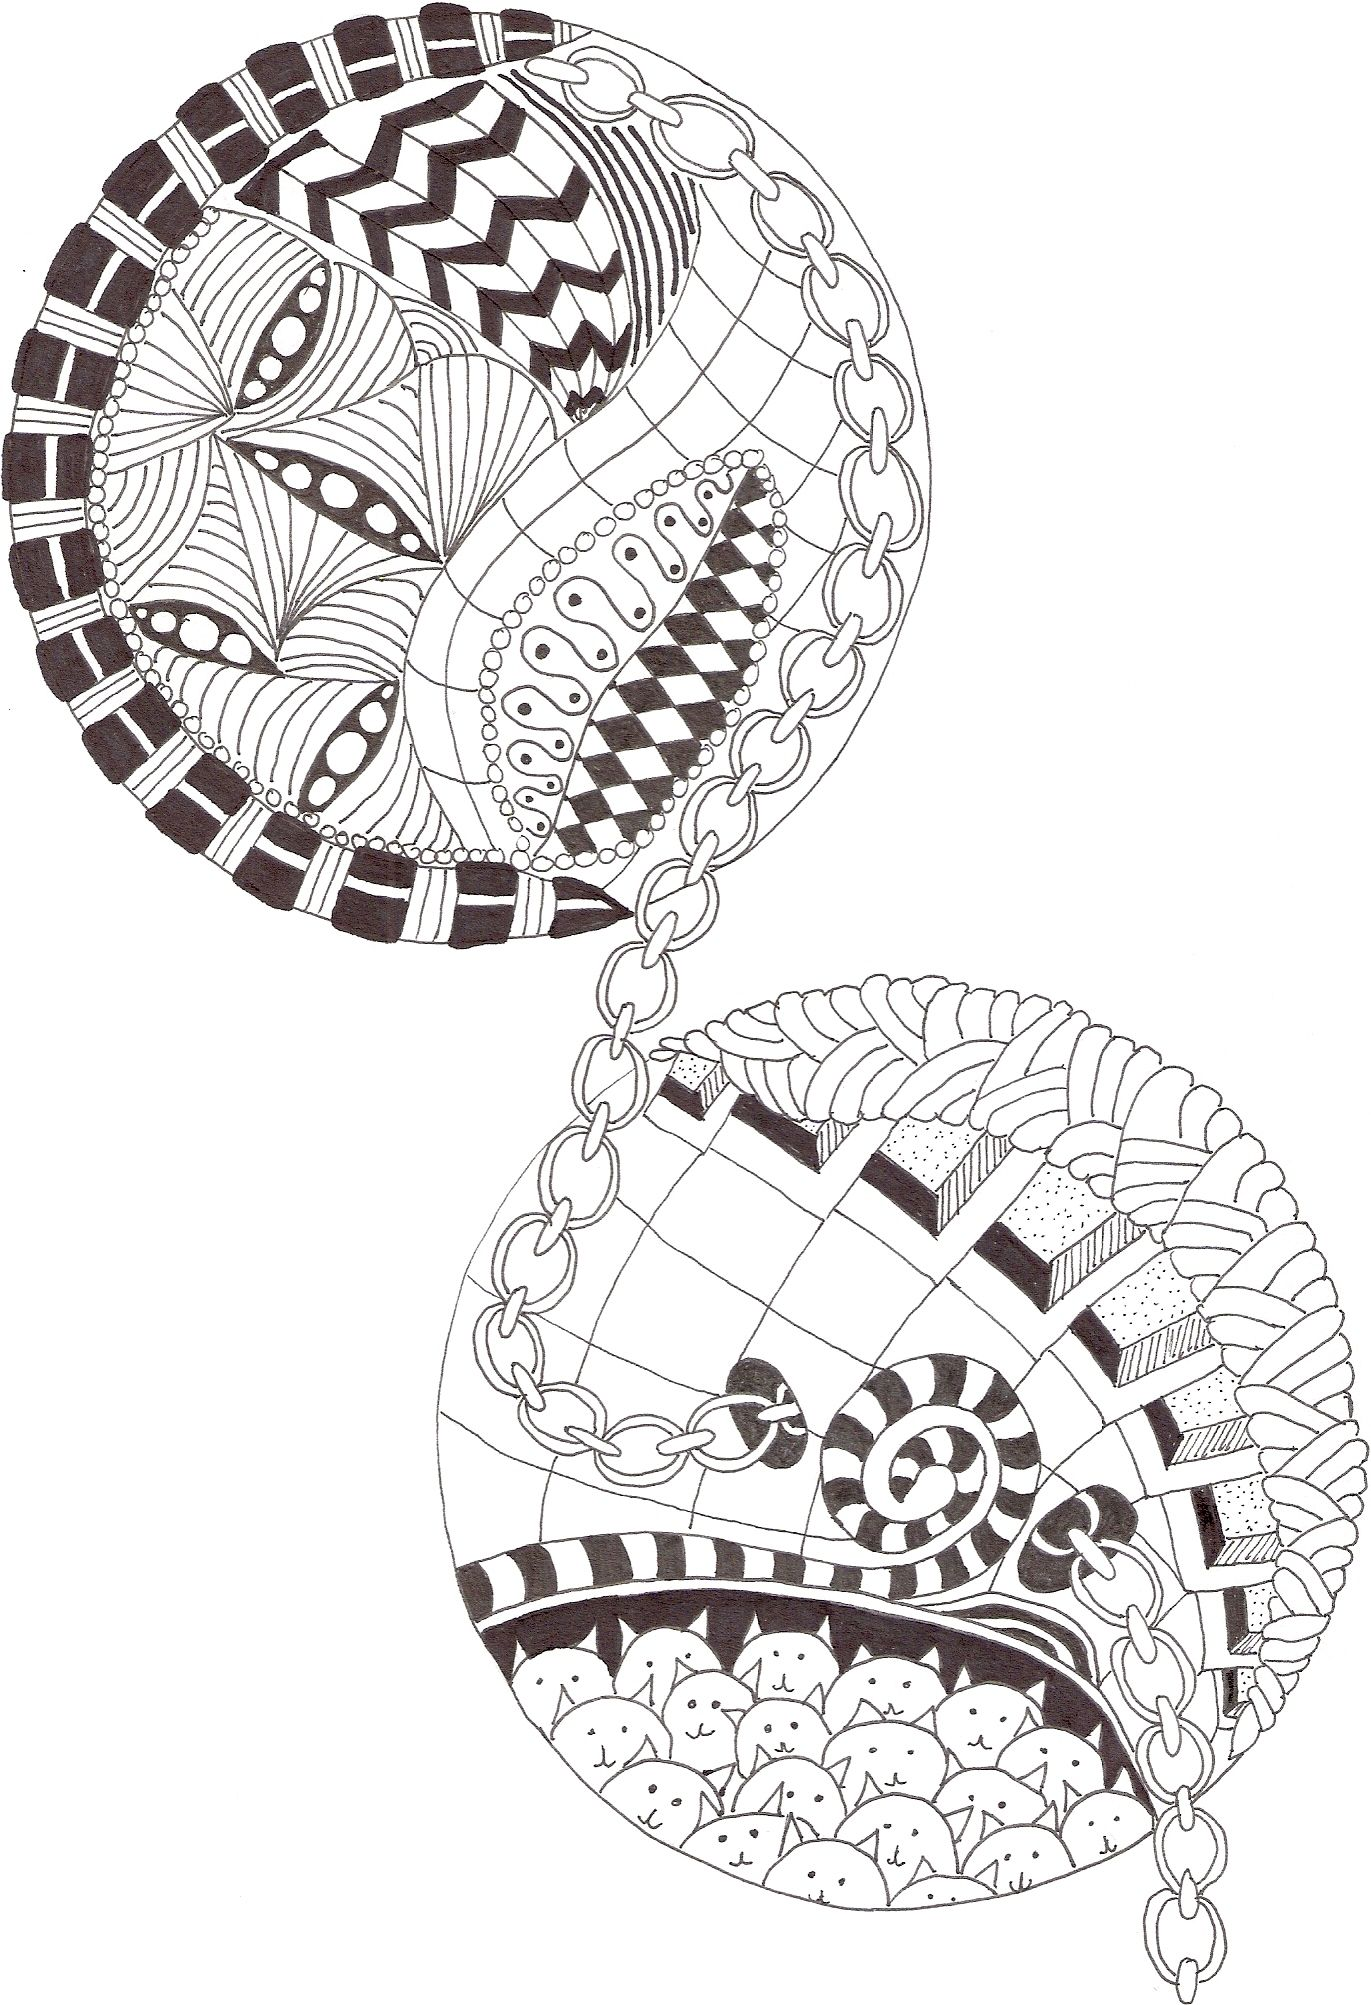 zentangle made by mariska den boer 12 kleurplaten